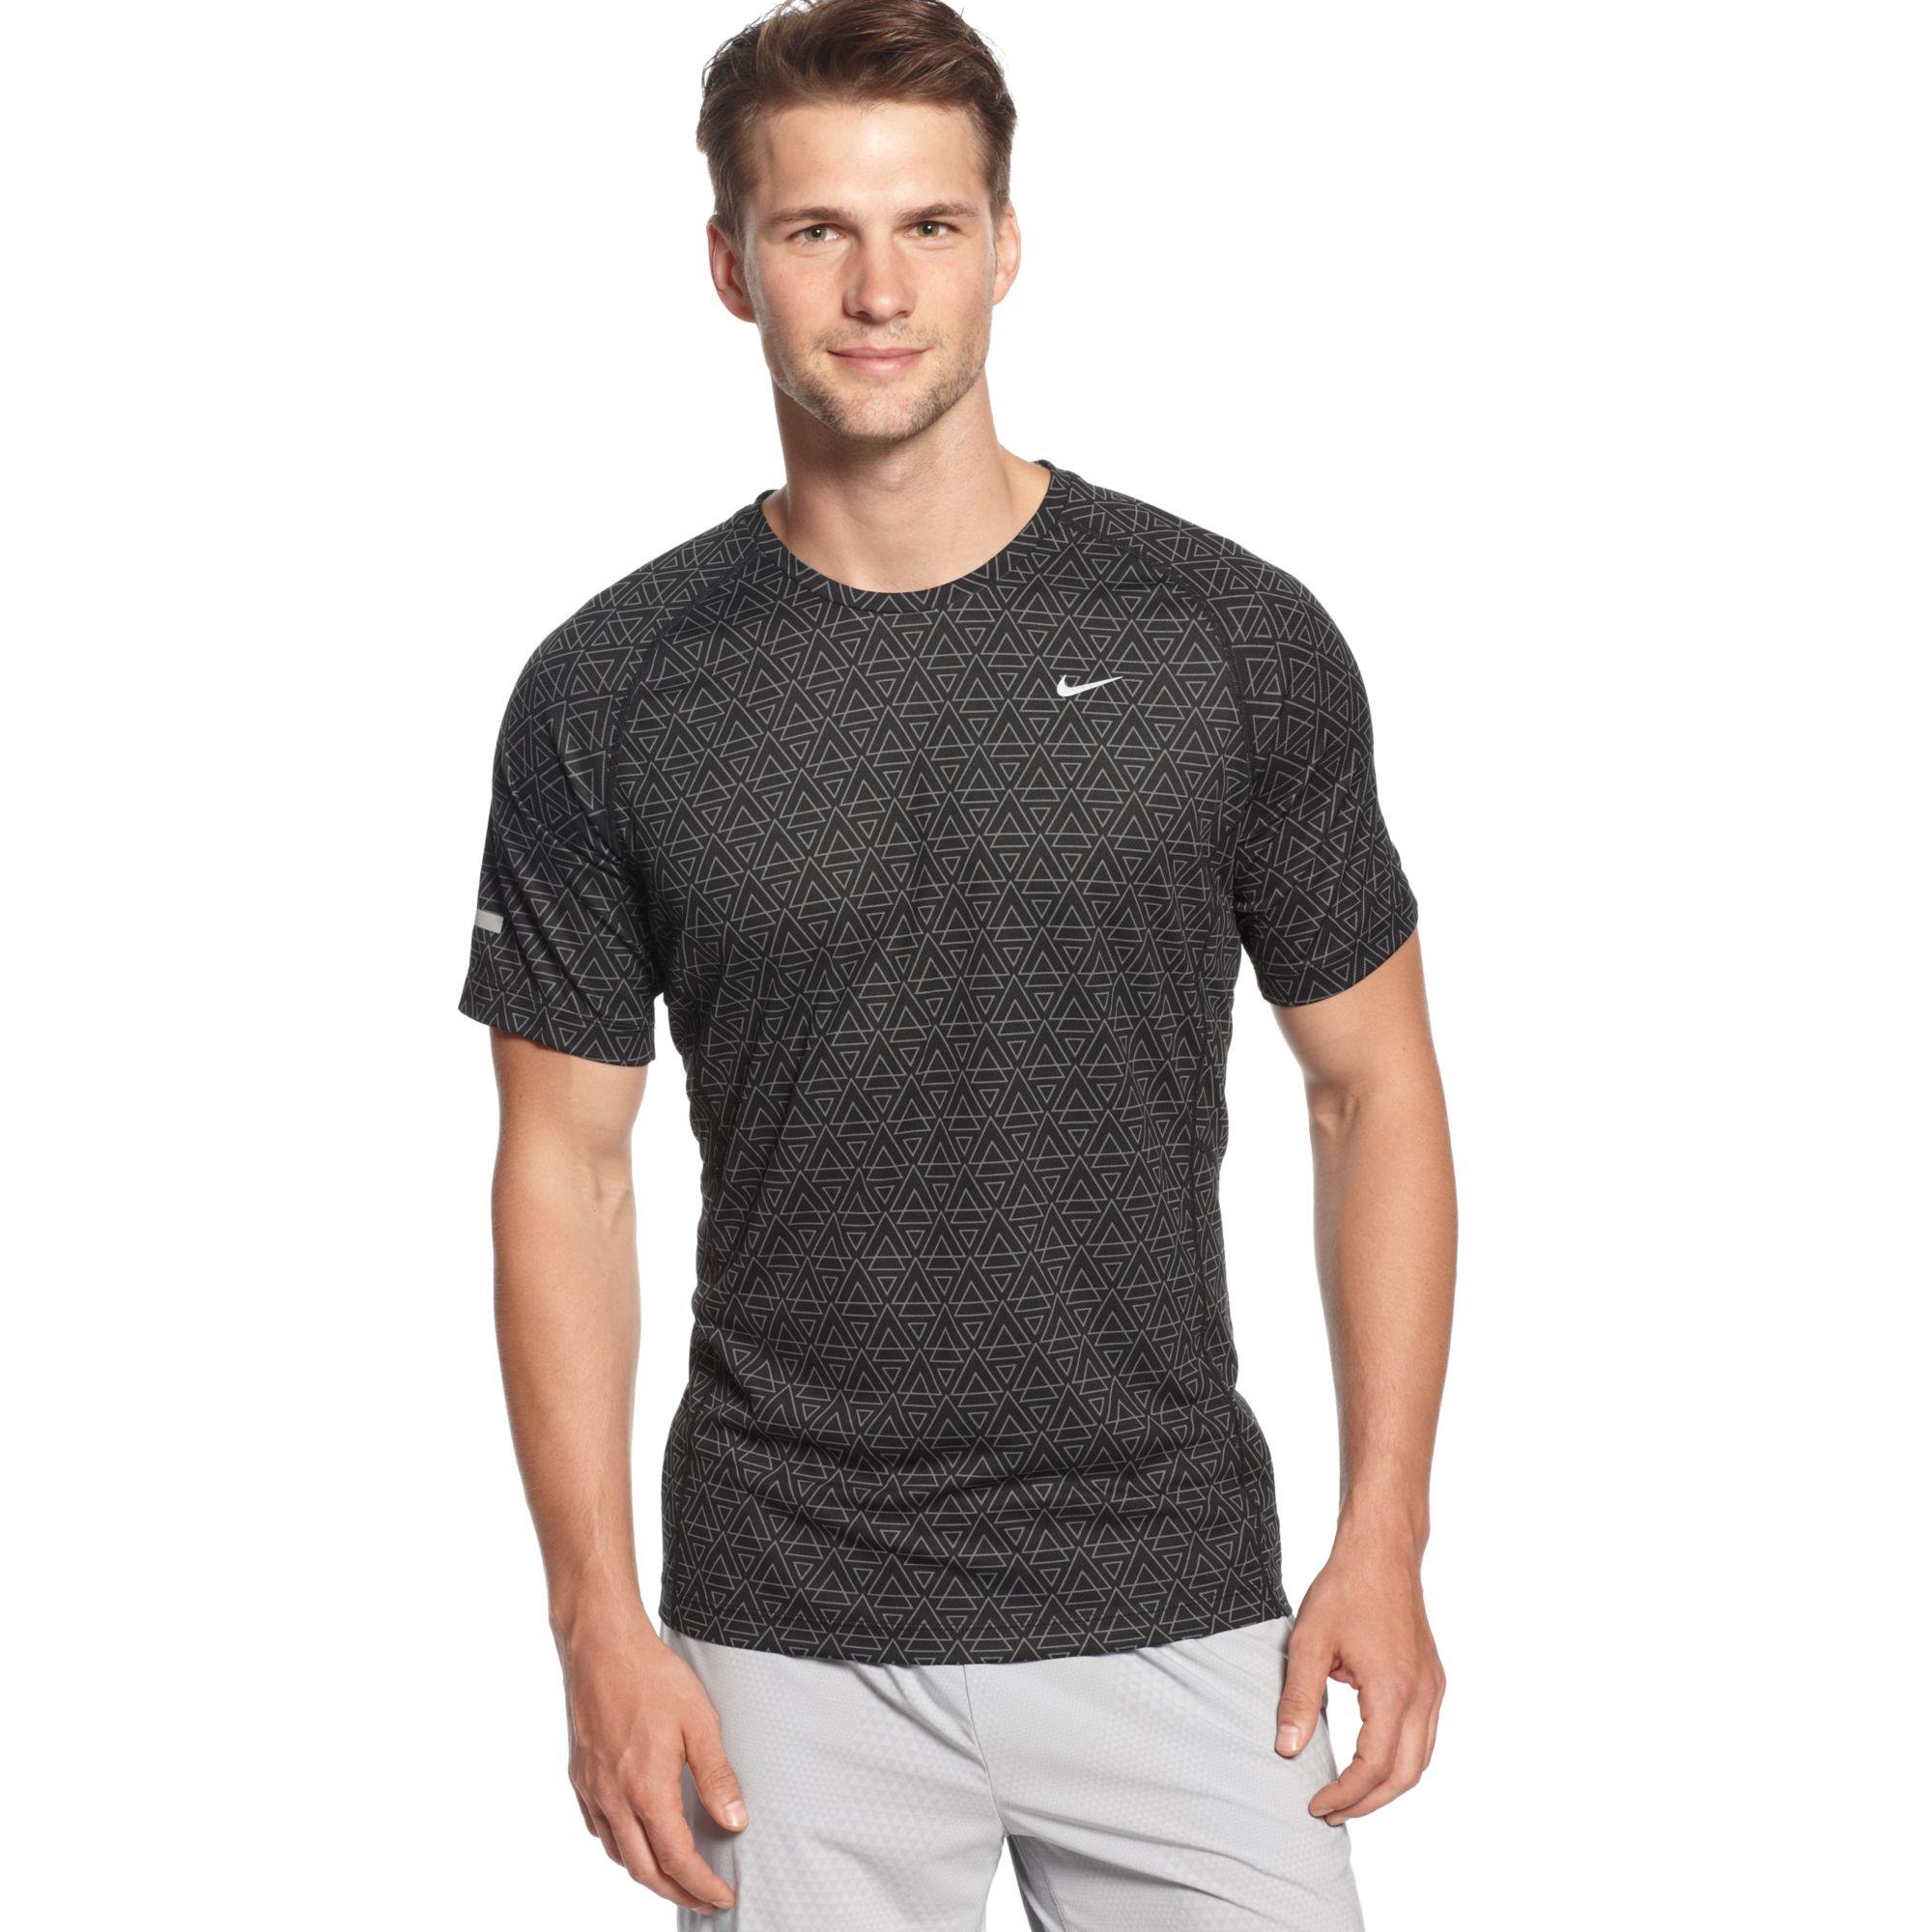 Nike Printed Miler Drifit Tshirt In Black For Men Black